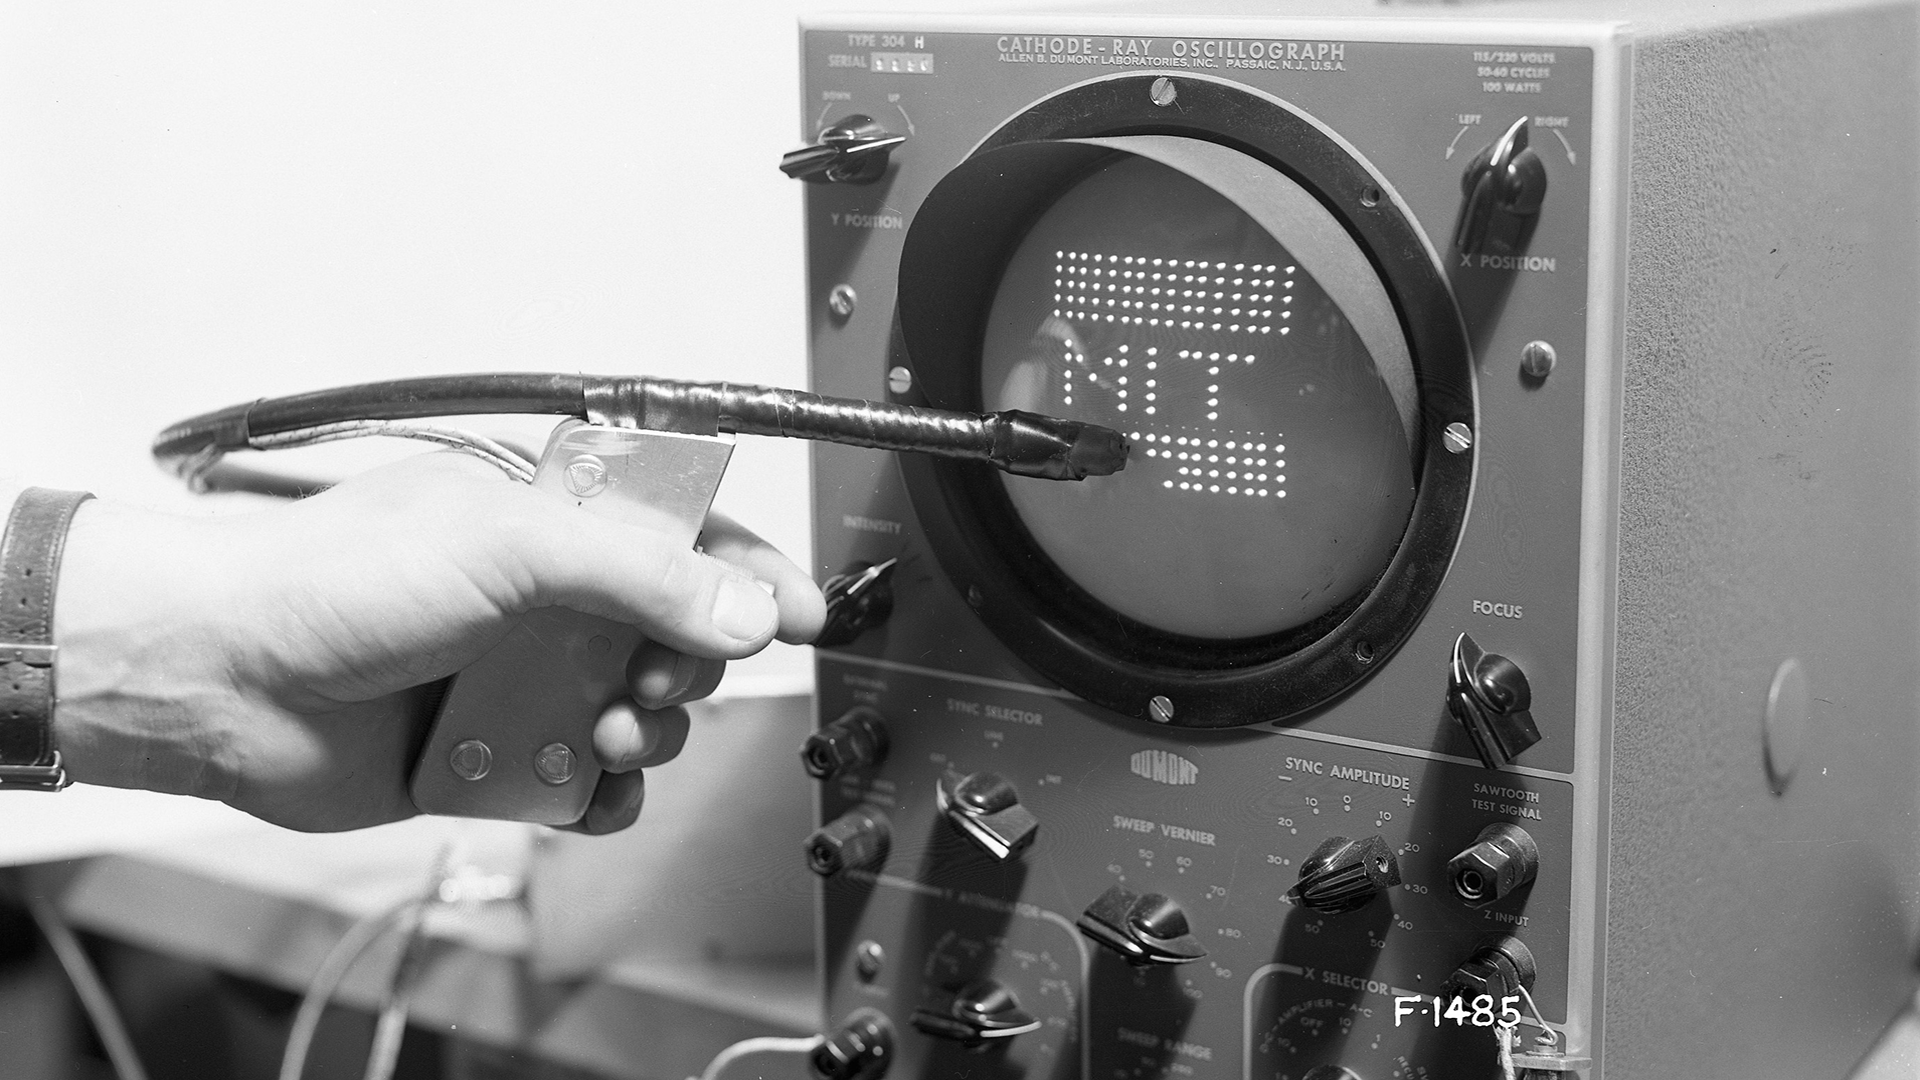 MIT Oscillograph